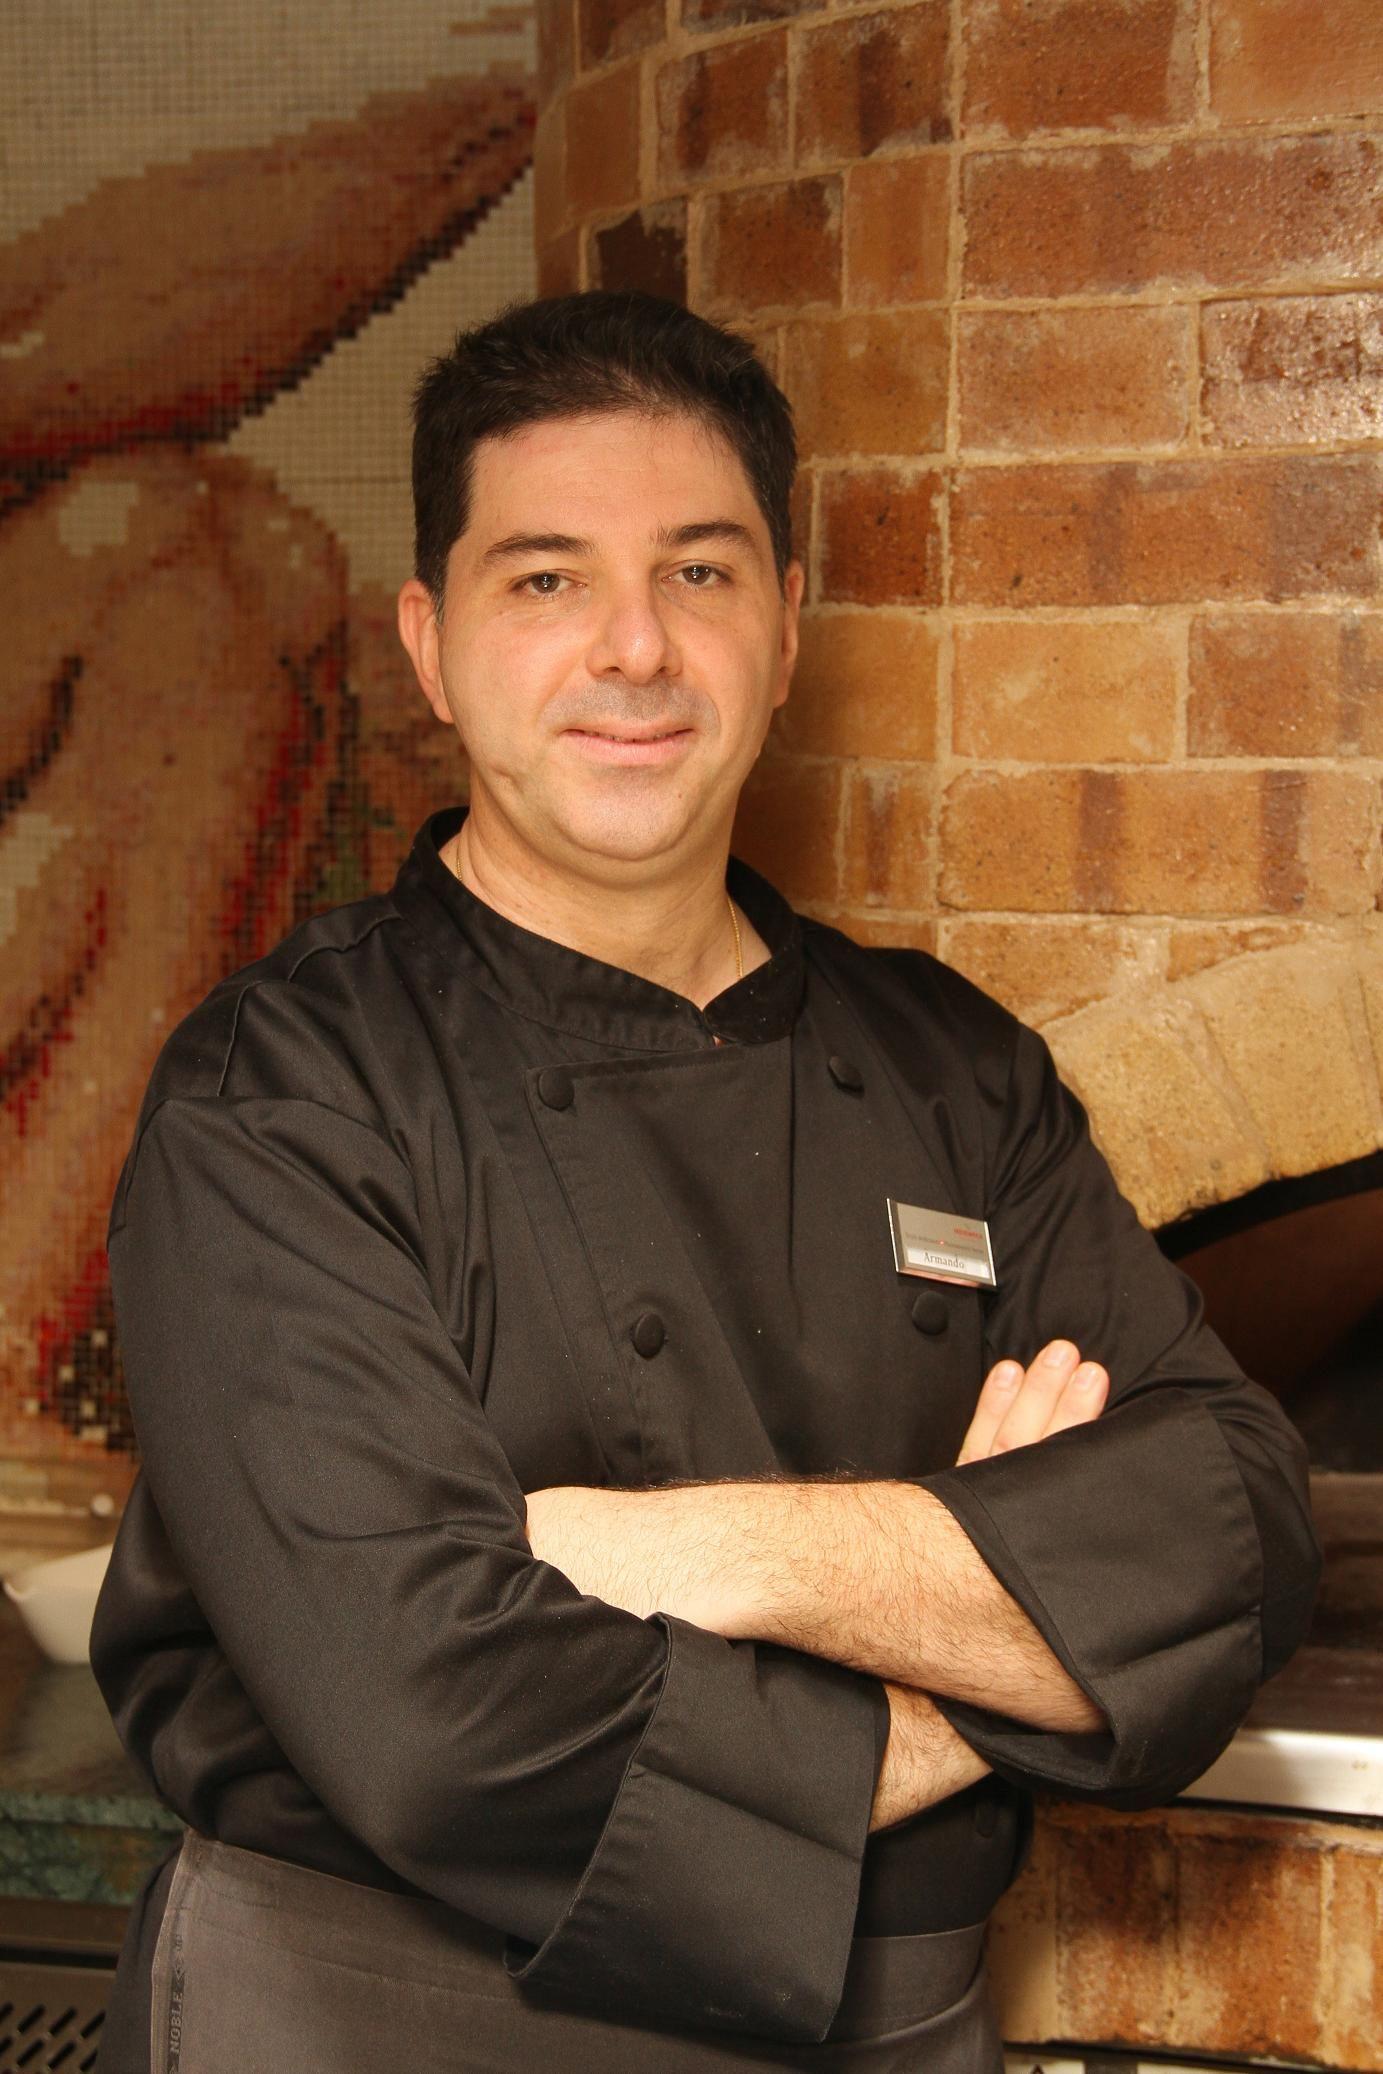 Italian Chef Armando Di Filippo Loves The Biryani In Bangalore - http://explo.in/1q8dbQt #MeetTheChef #Restaurants